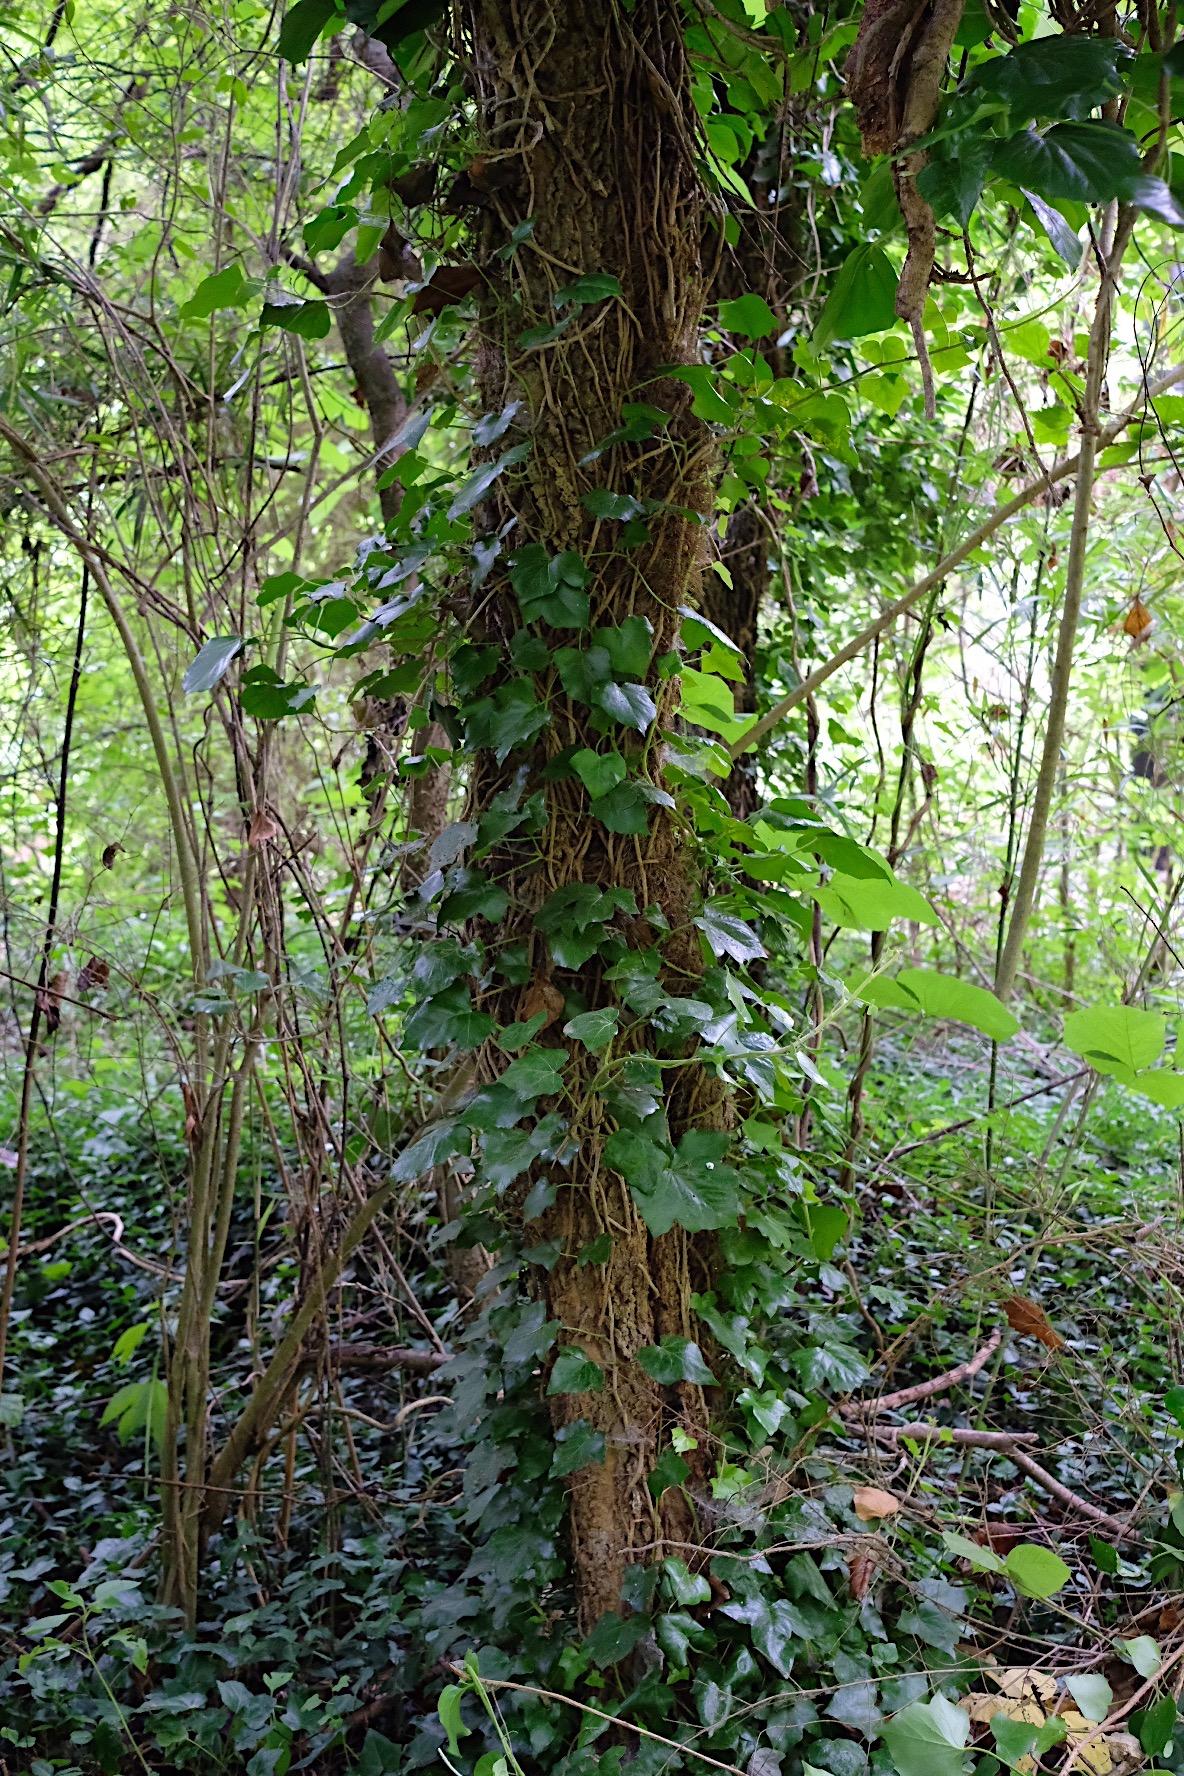 Ivy climbing a tree